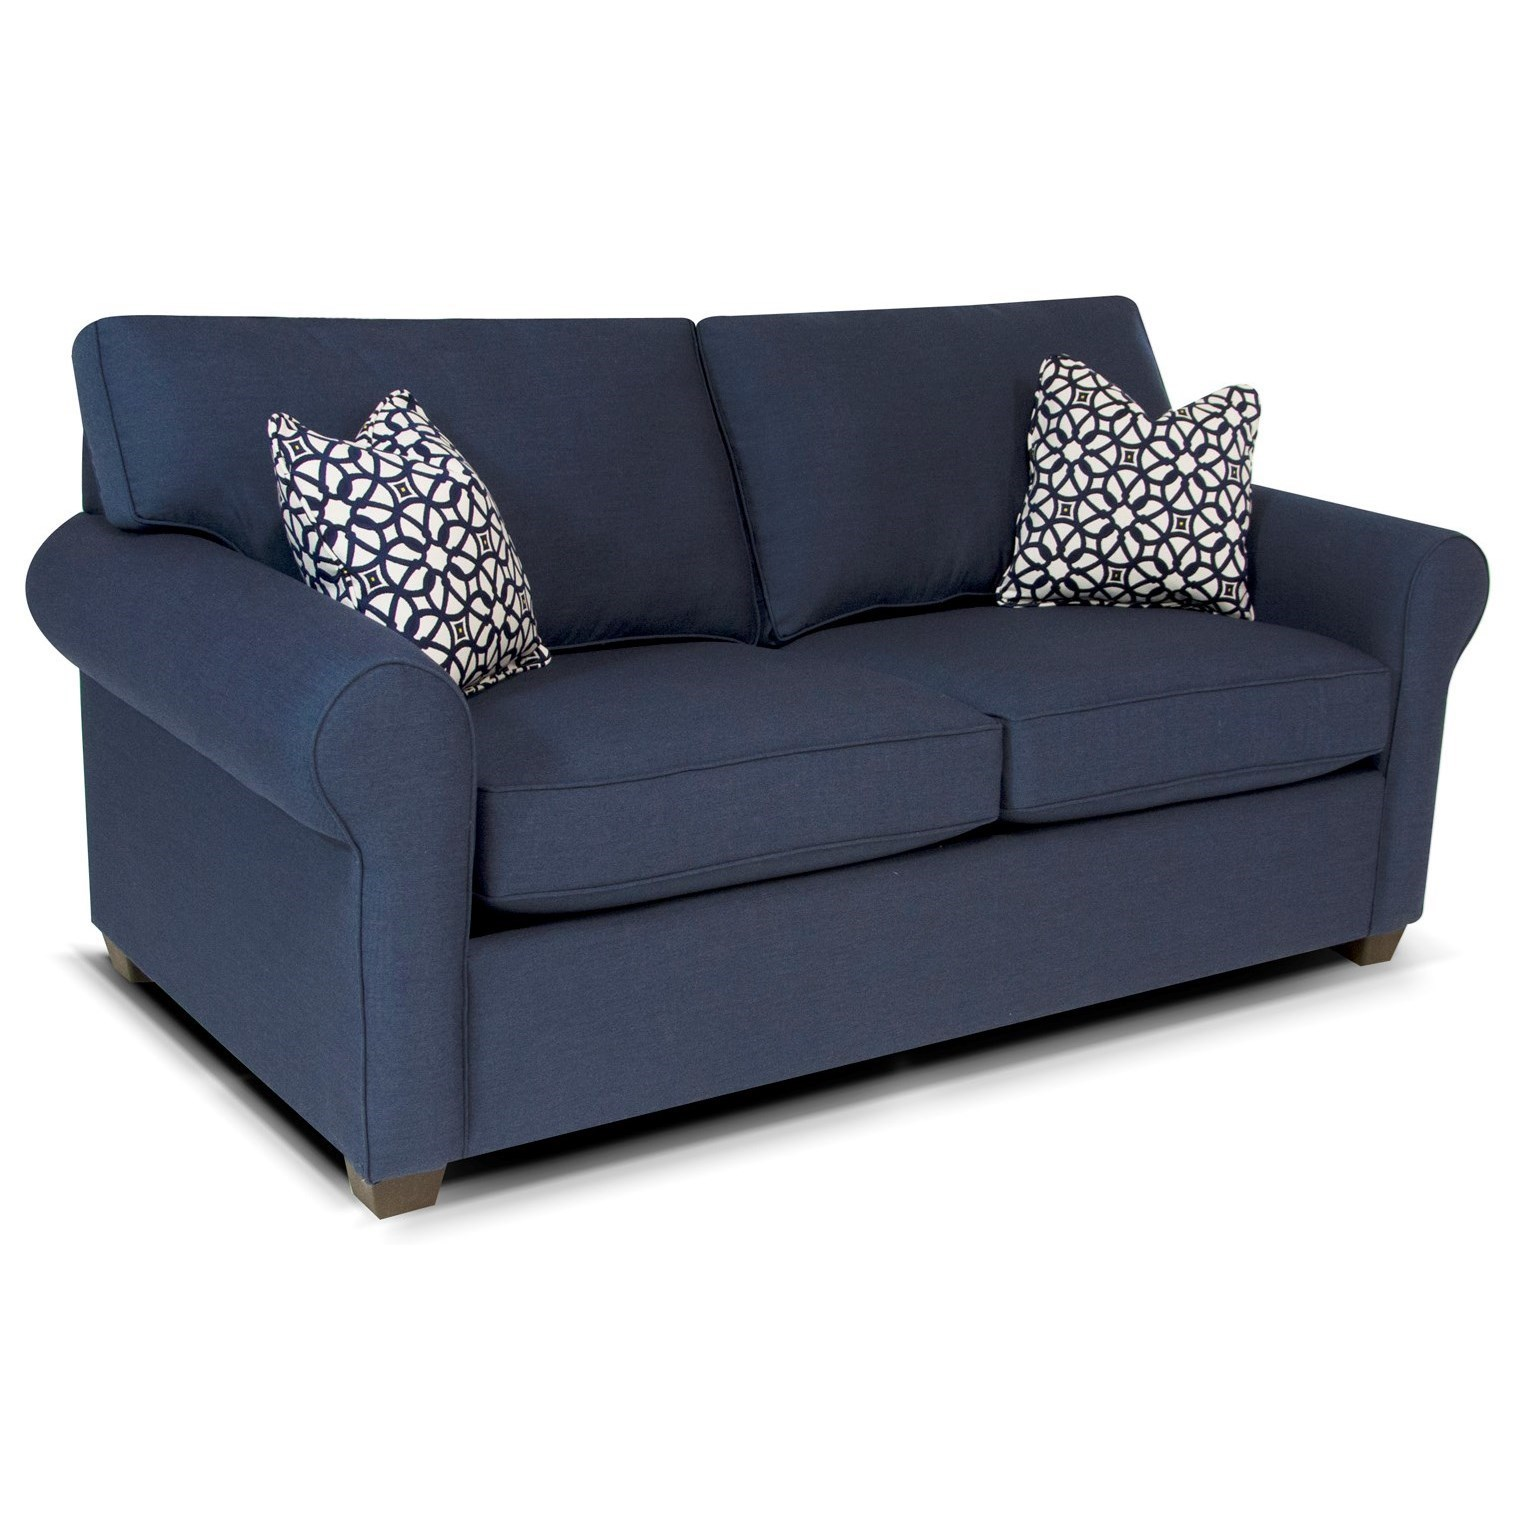 england sleeper sofa reviews hotel sofas sleepers